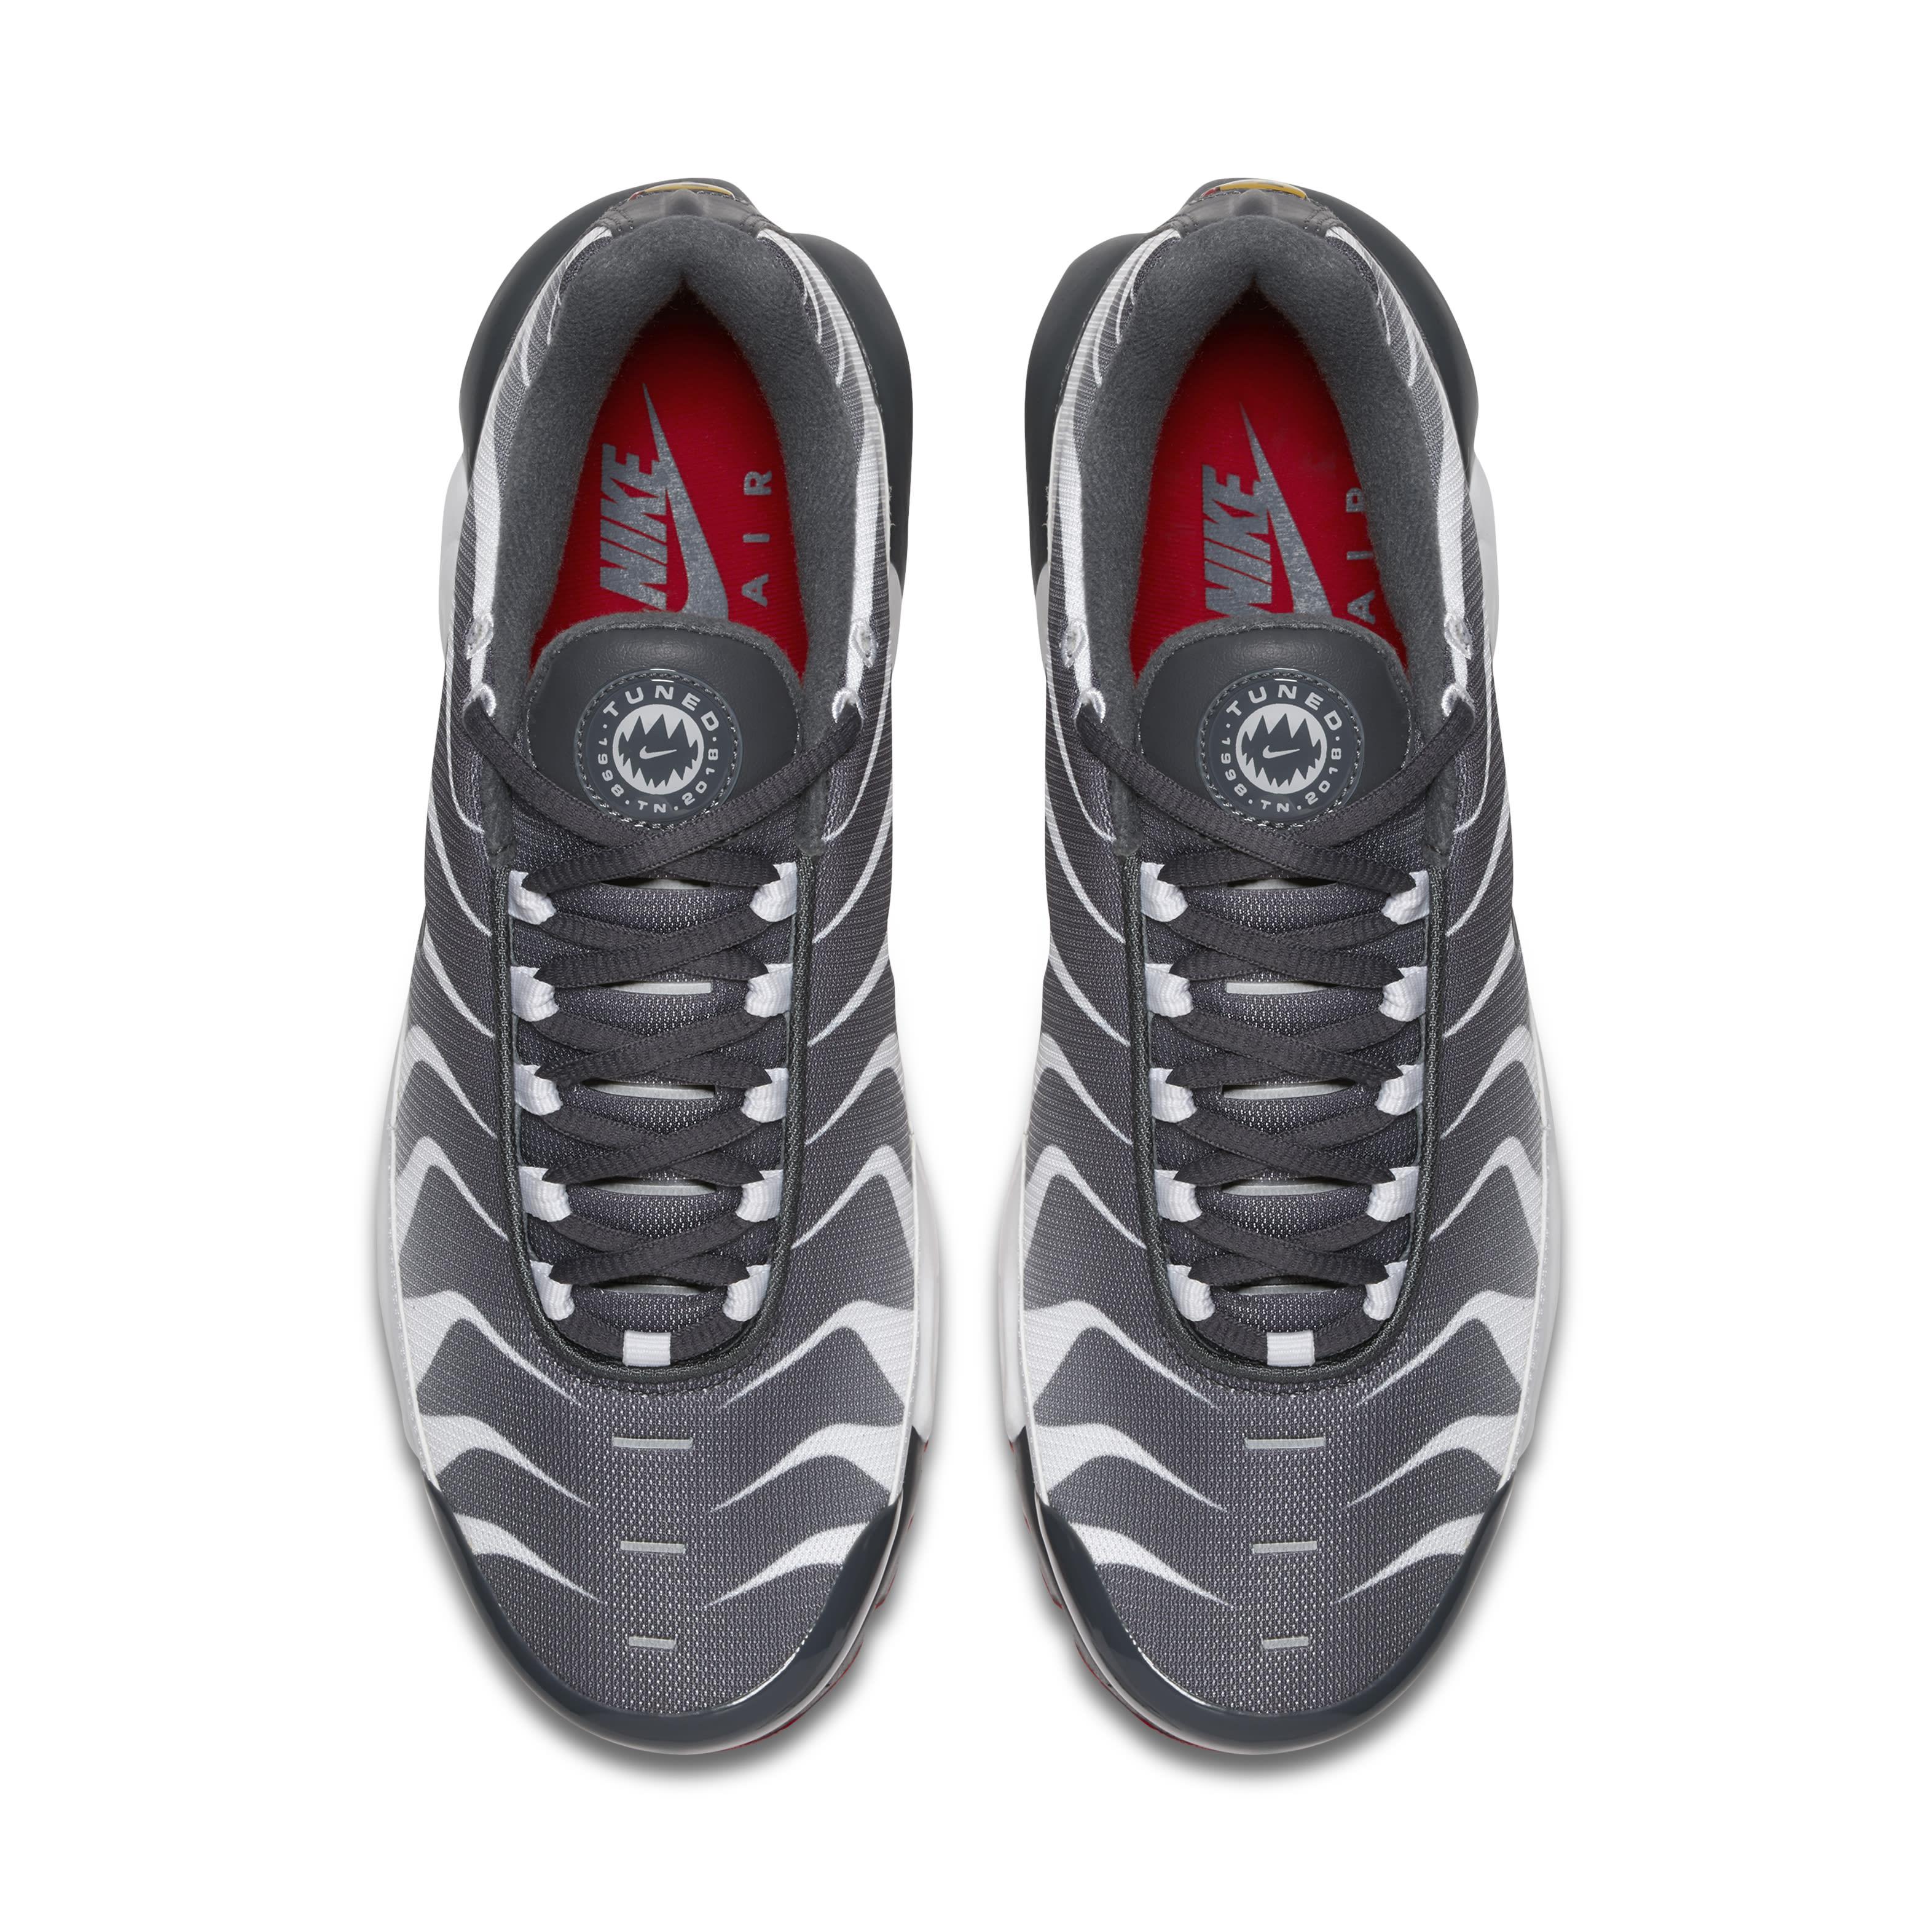 buy online 60413 4491d italy nike air max foot locker tn tumblr ece3a 9edfb